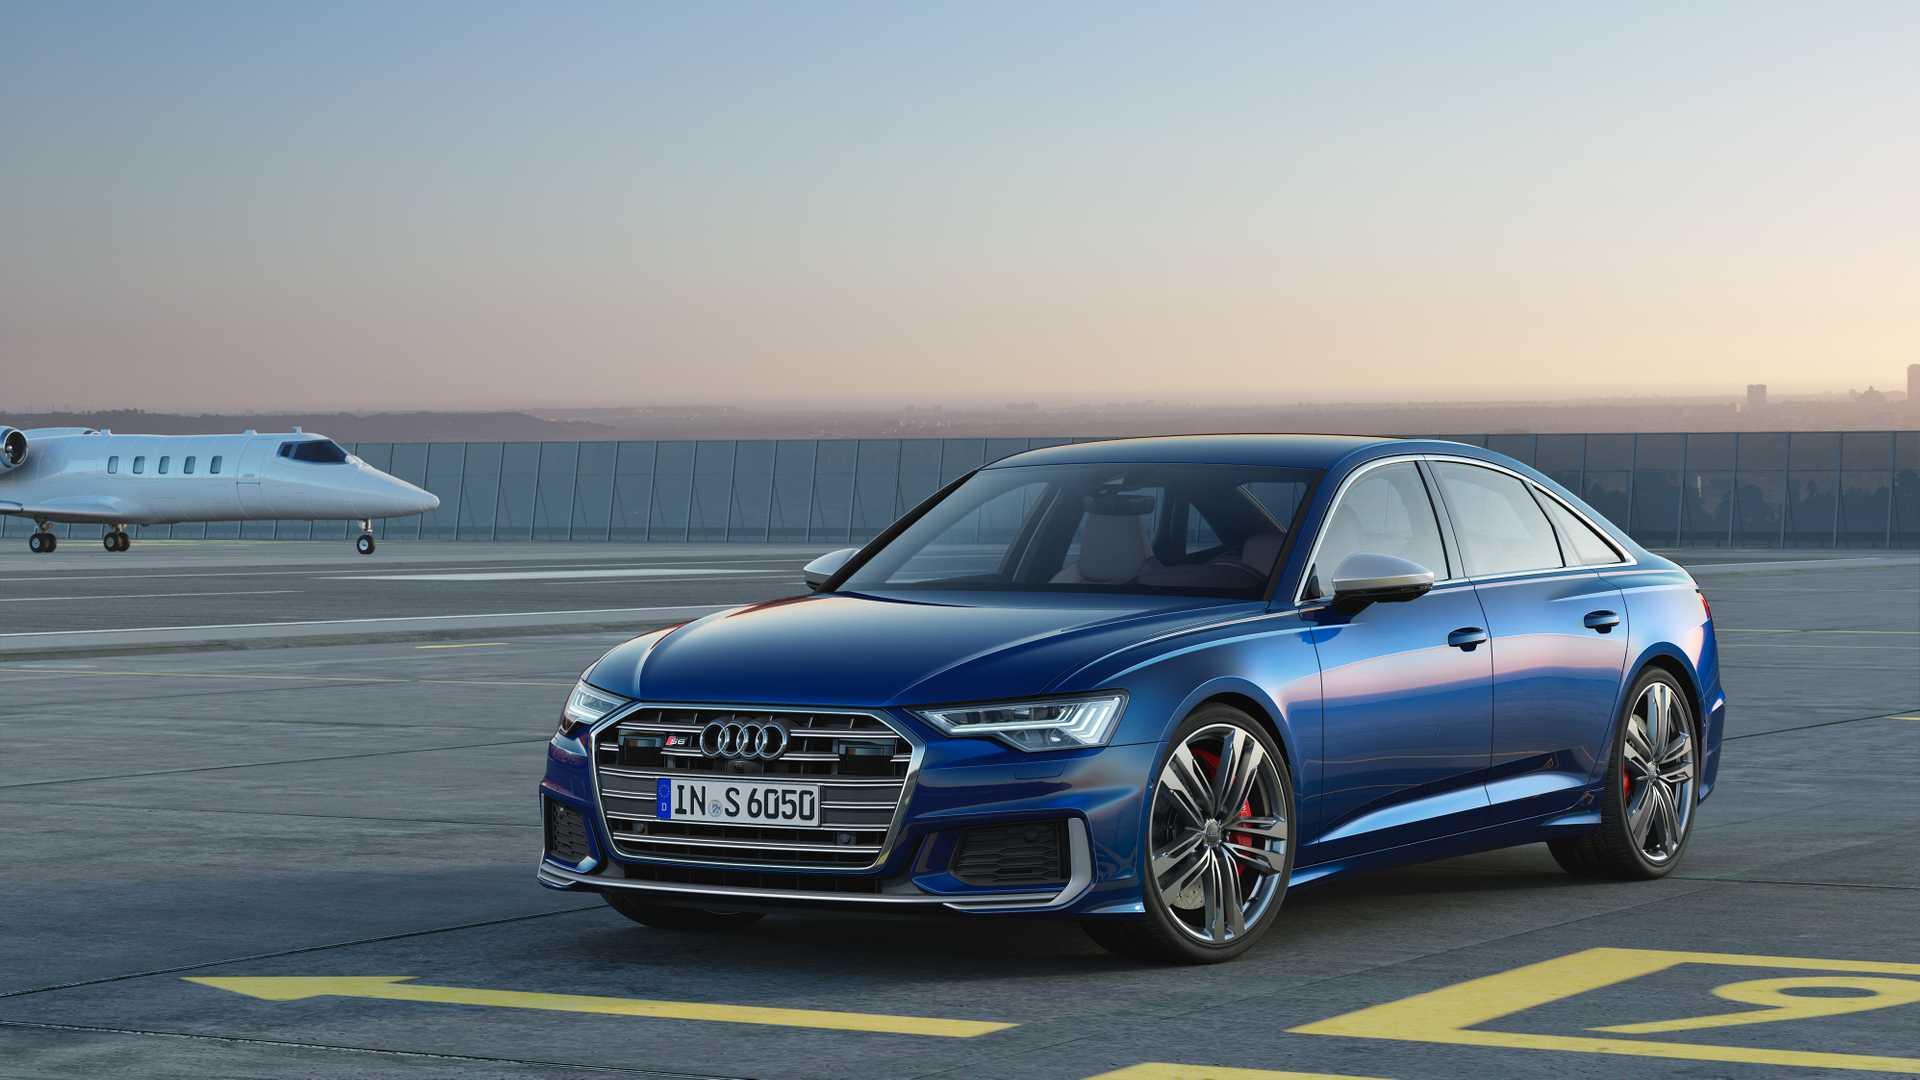 2019 Audi S6 Sedan TDI (Color: Navarra Blue) Front Wallpaper (11)